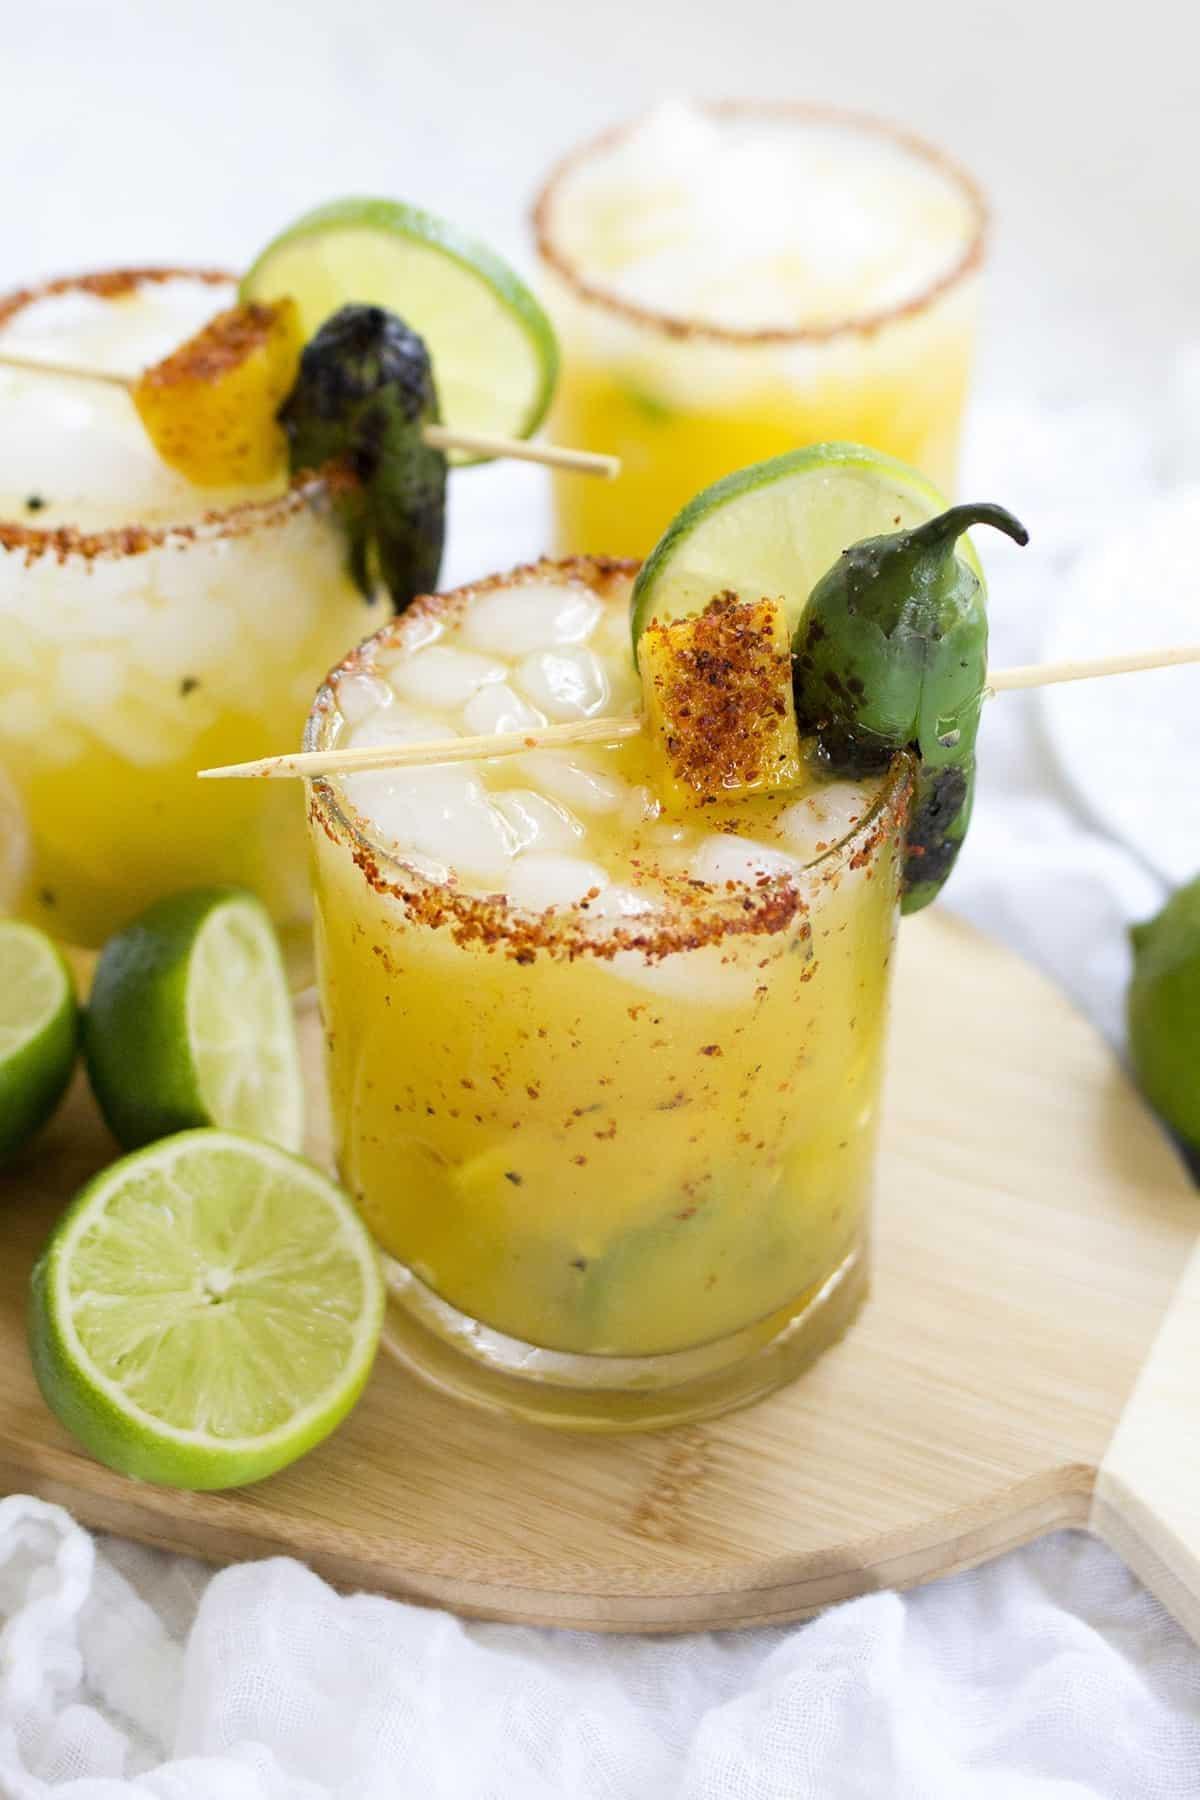 Spicy mango jalepeno margarita